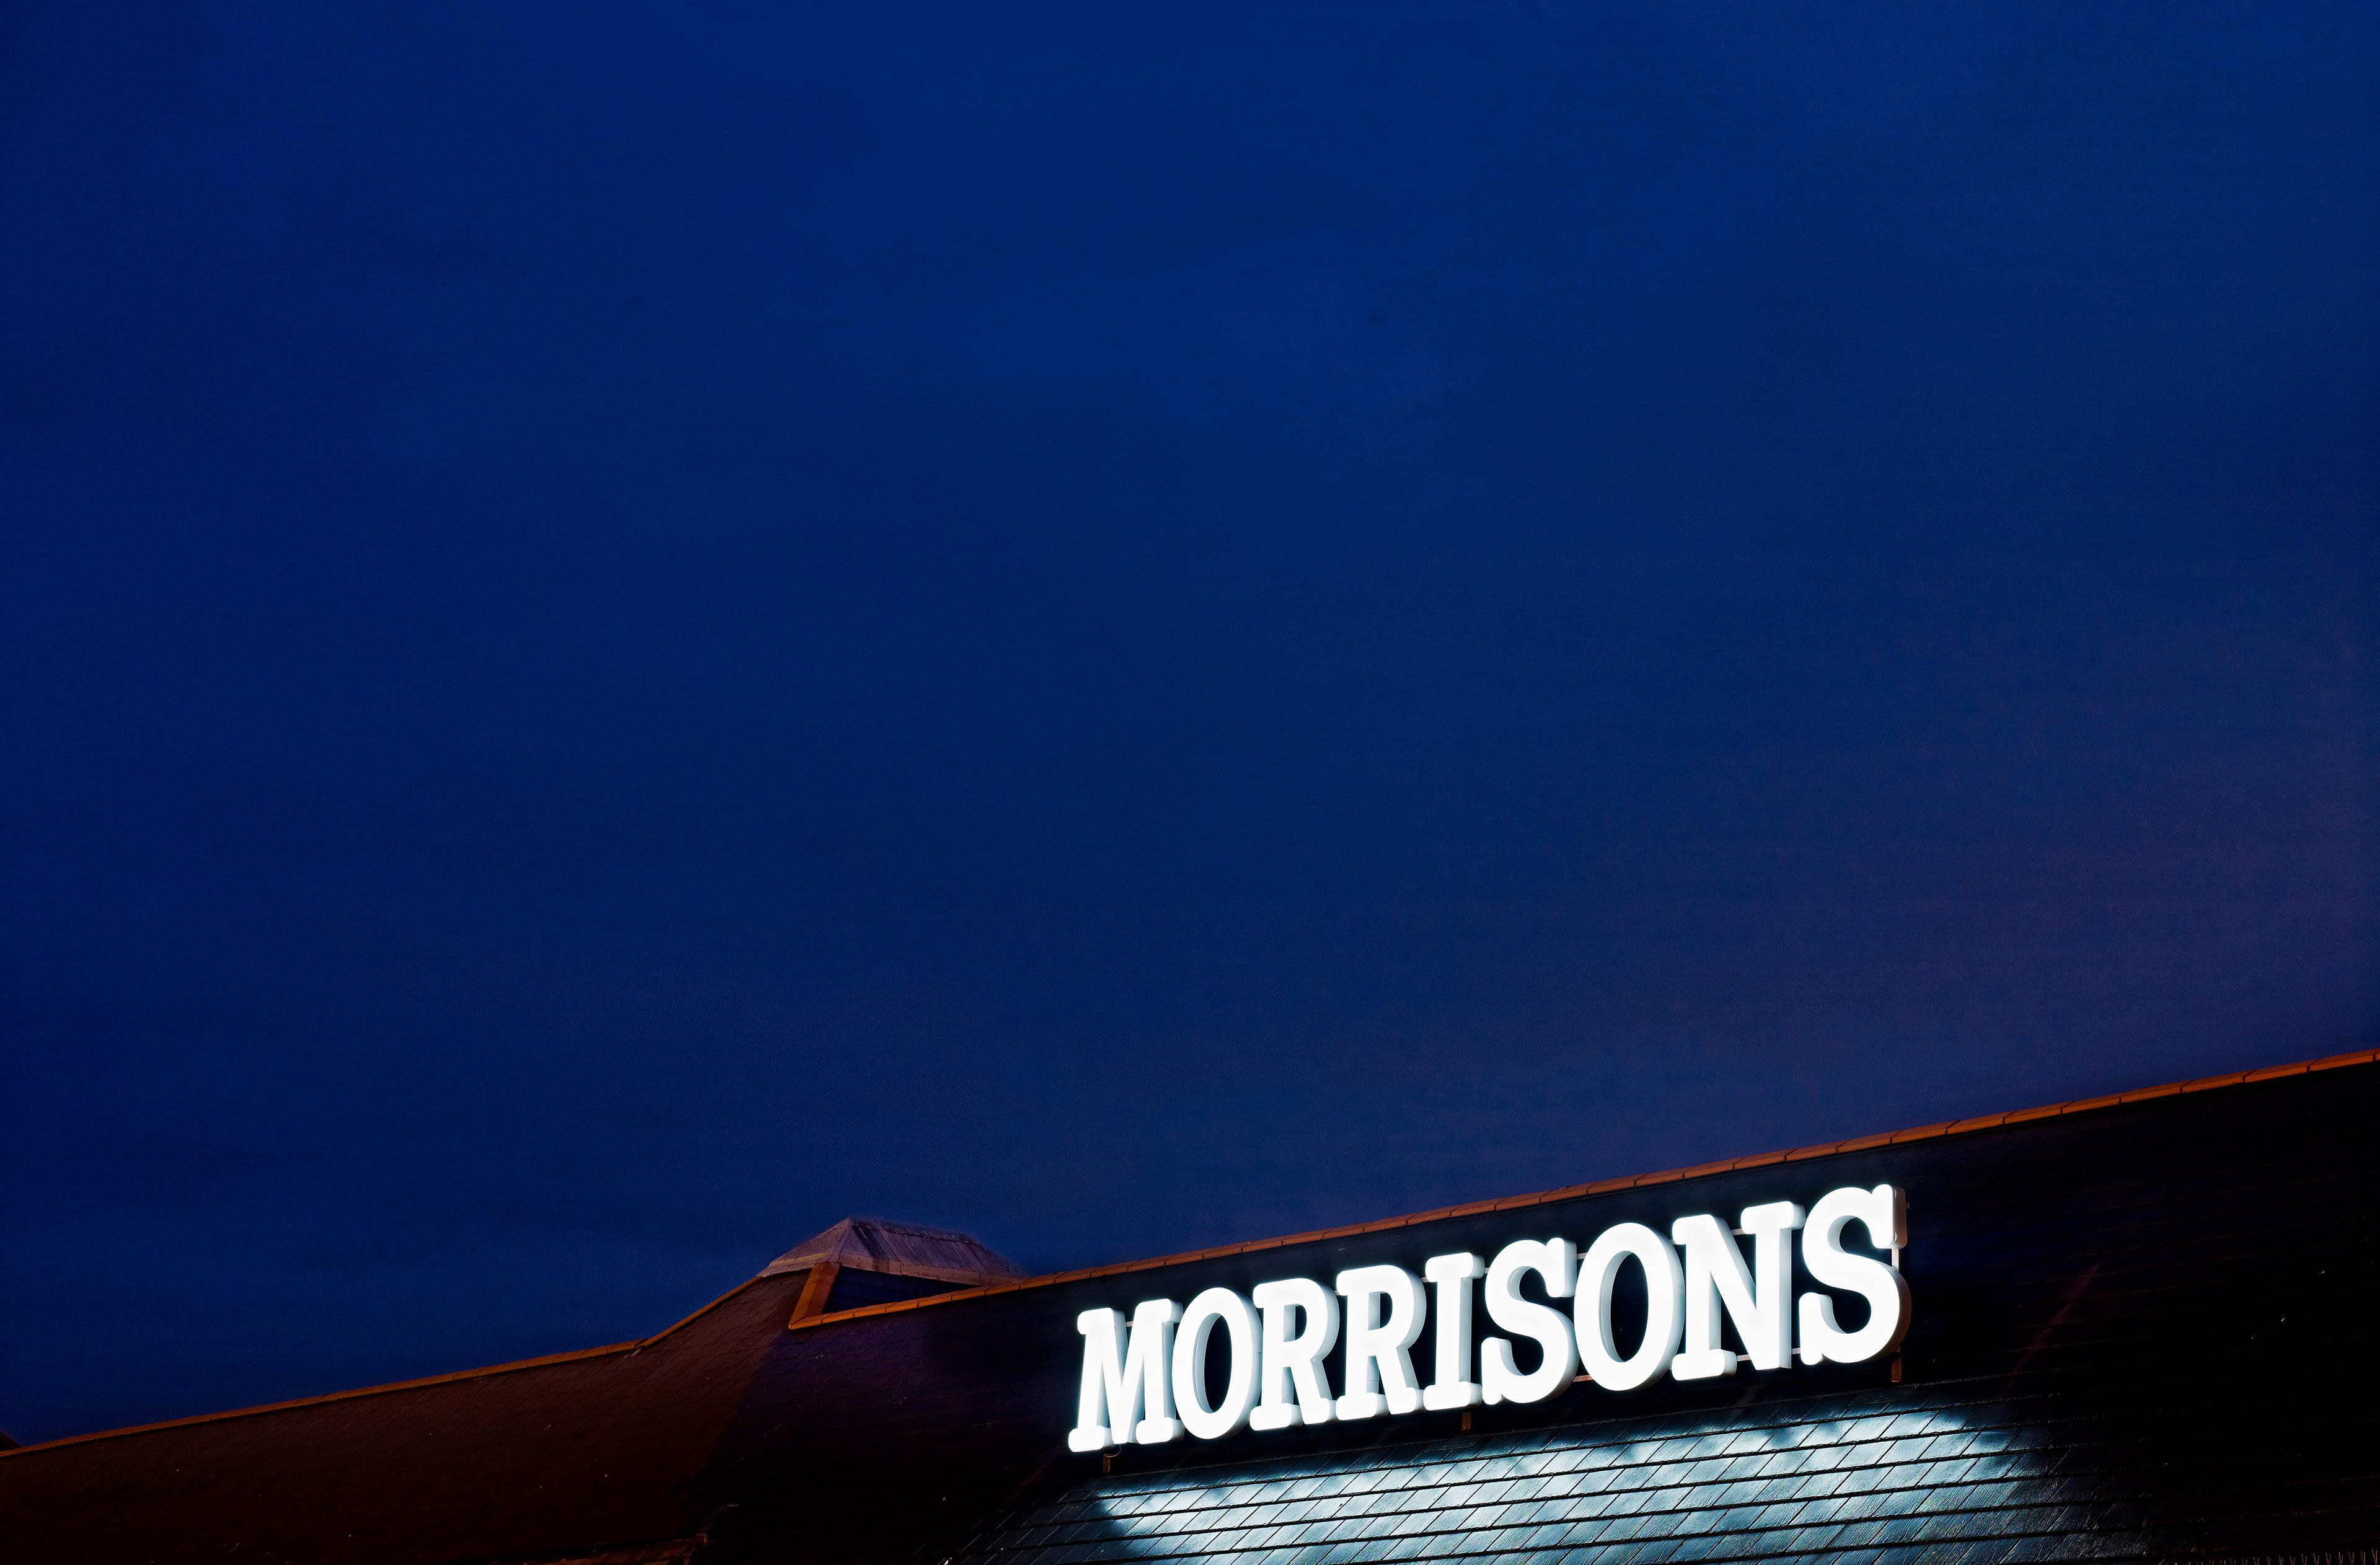 Richard Moran Morrisons Lifstyle People 023